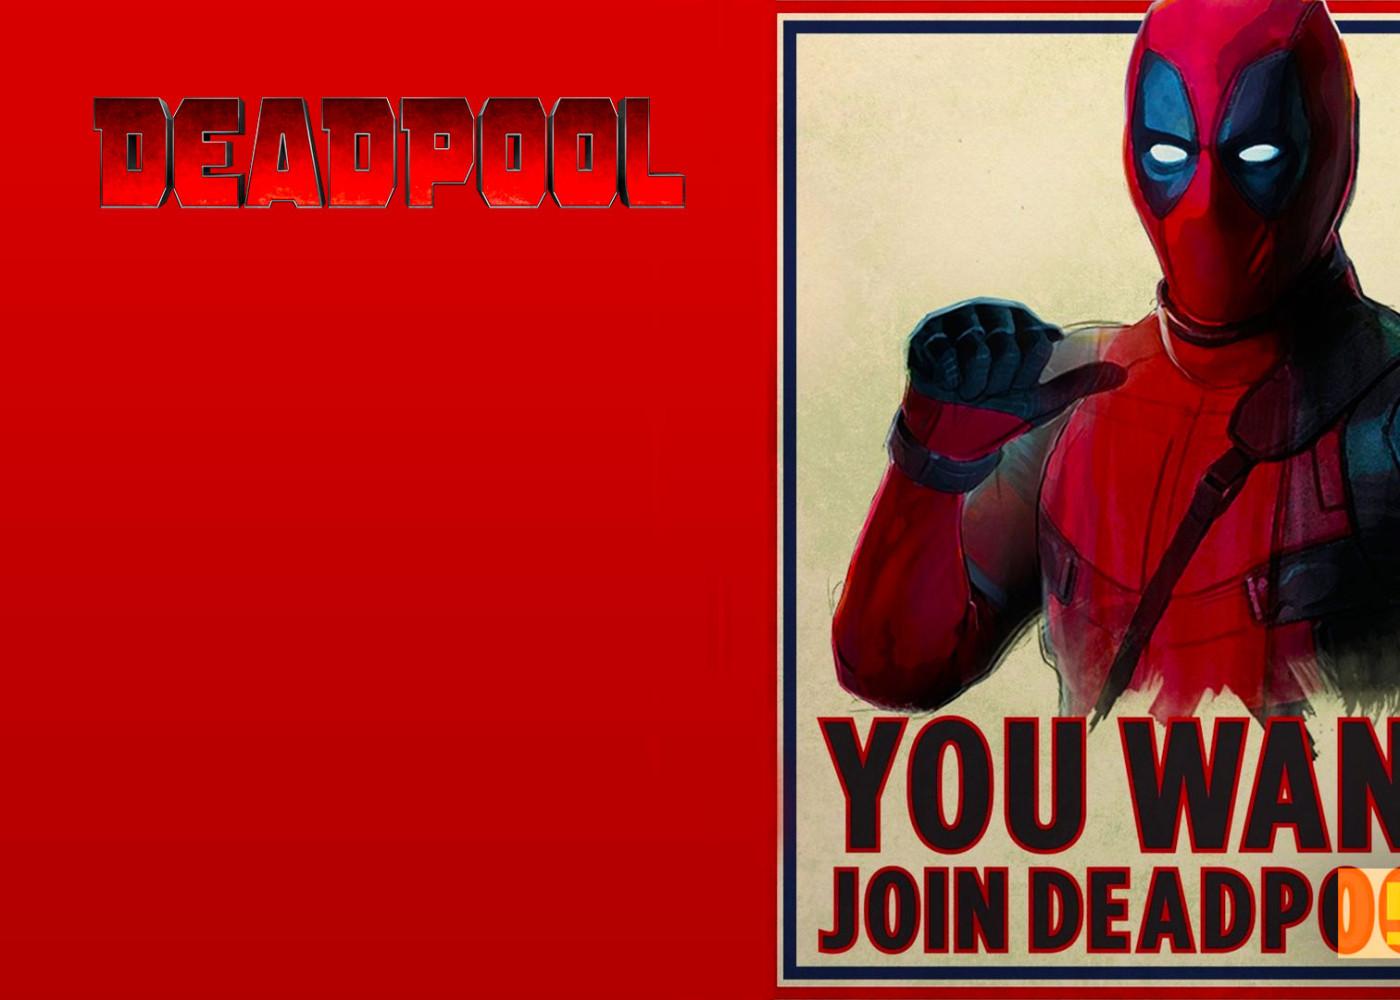 deadpool core. fox. marvel. deadpool. the action pixel. @theactionpixel